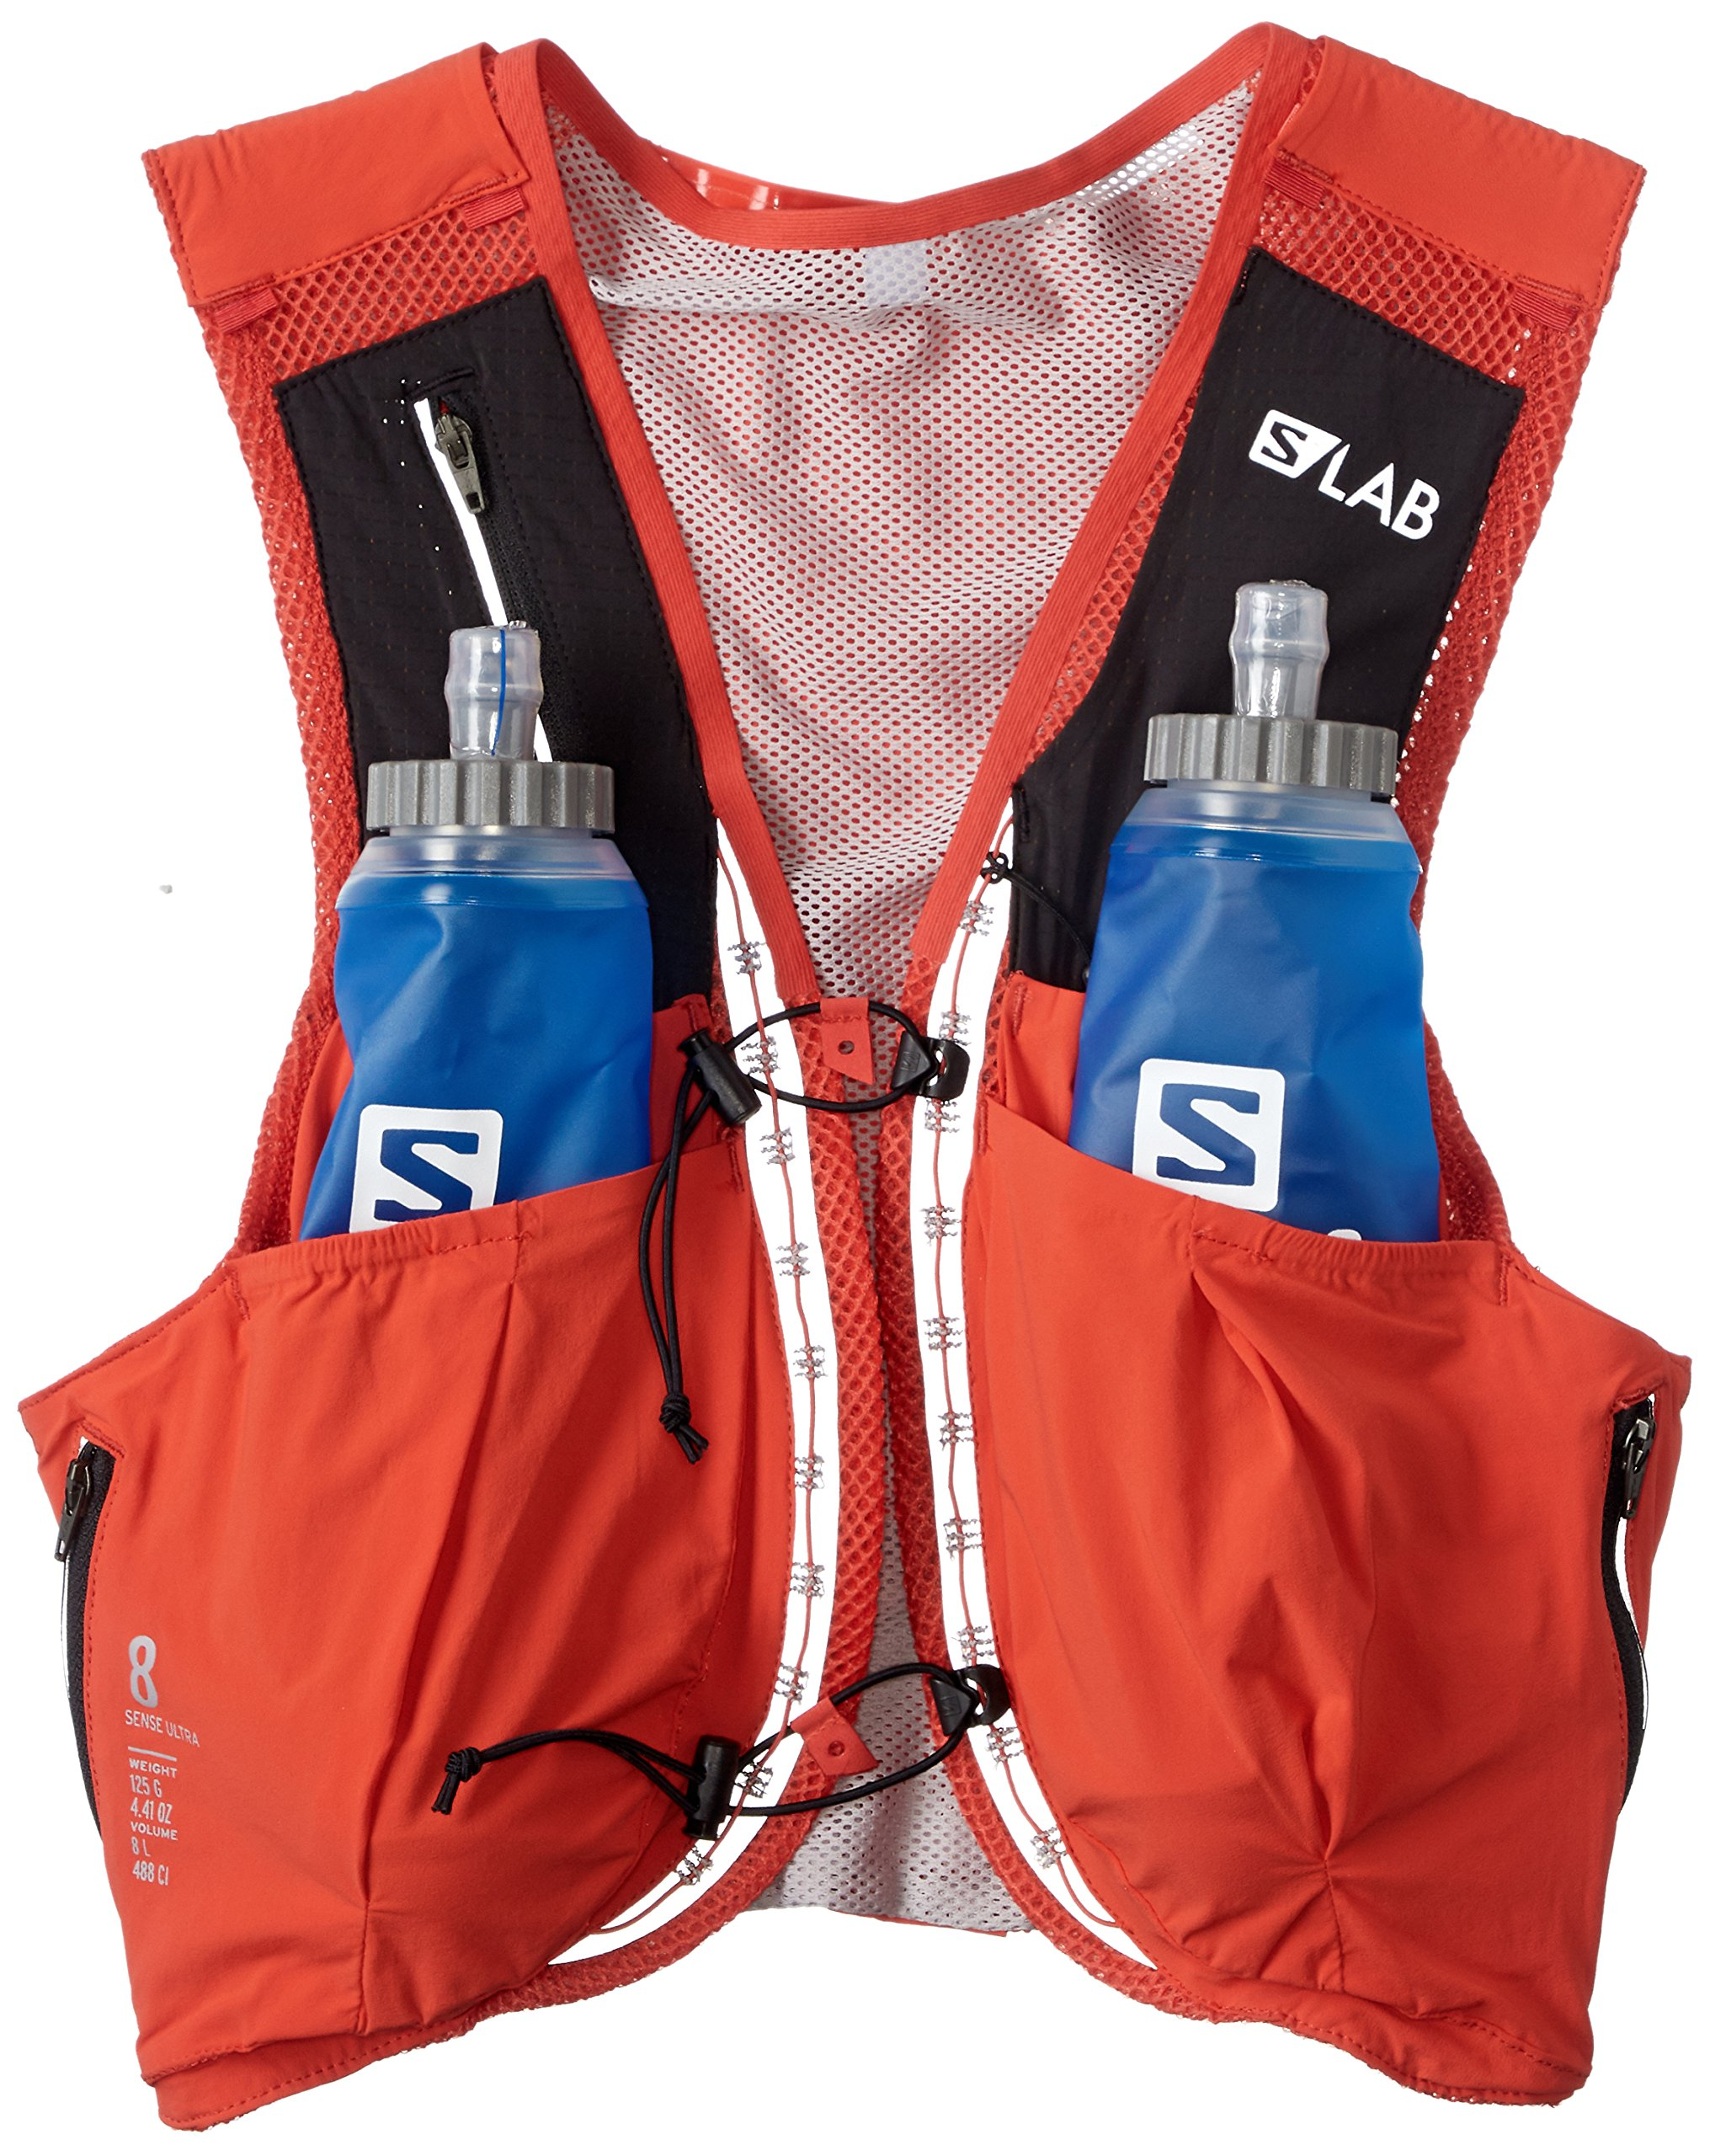 Salomon Unisex S/Lab Sense Ultra 8 Set Hydration Vest, Racing Red, Large by Salomon (Image #1)